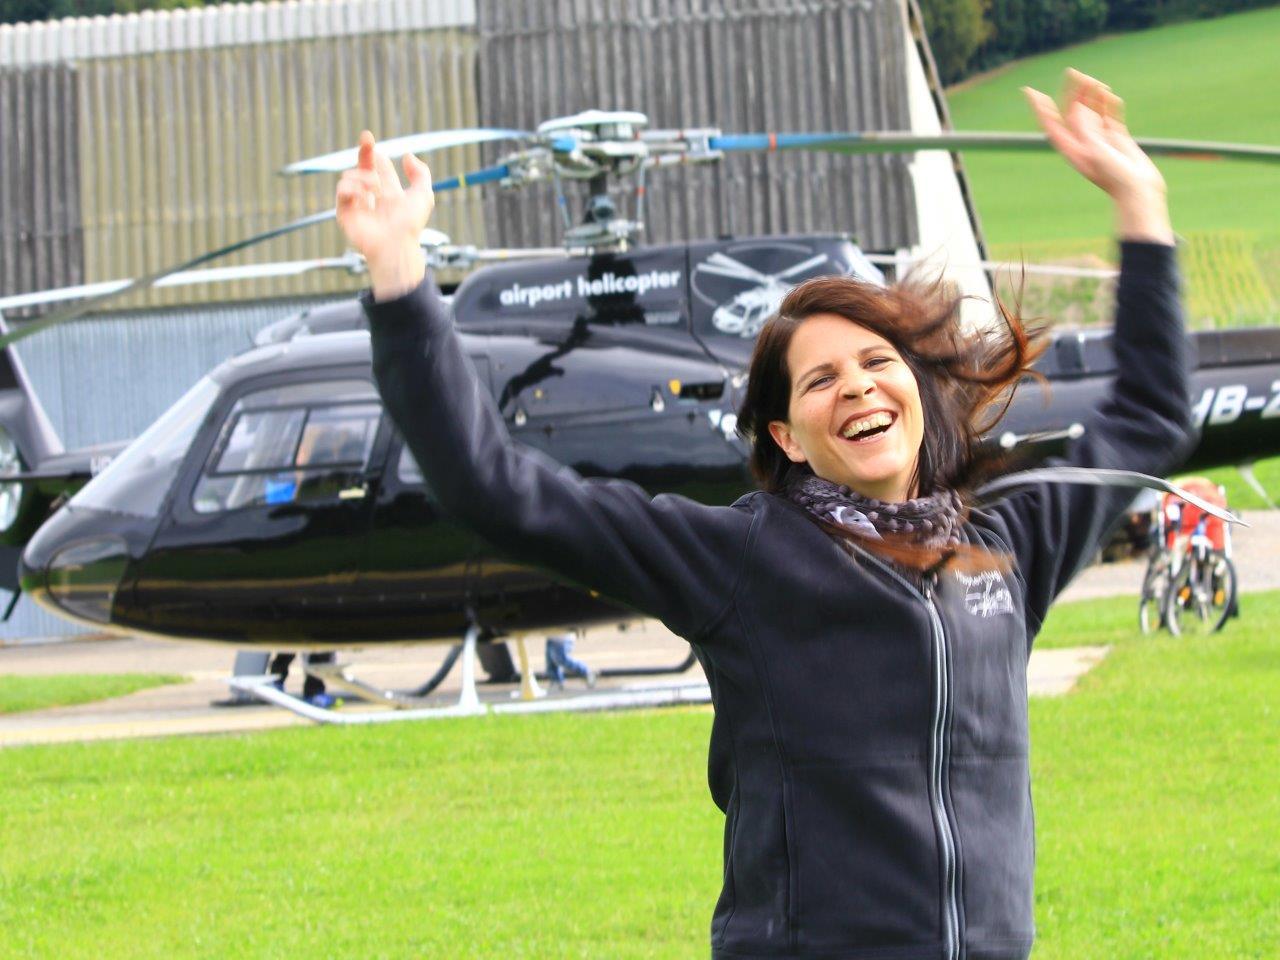 Hubschrauber selber fliegen Freude